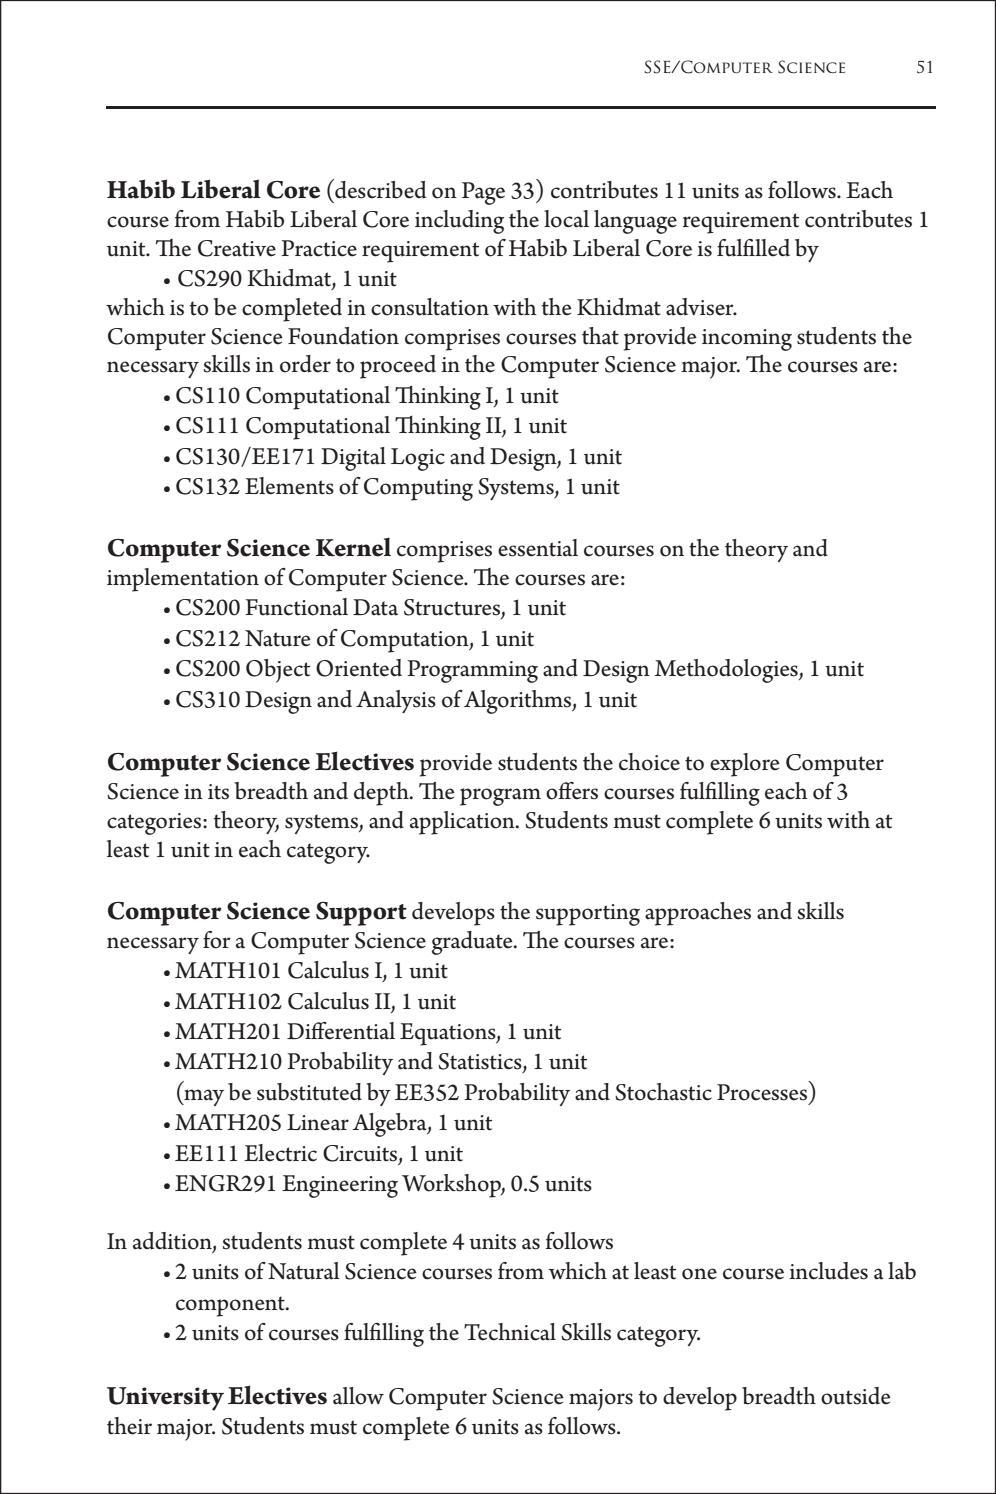 Habib University - Course Catalog 2015/2016 by Habib